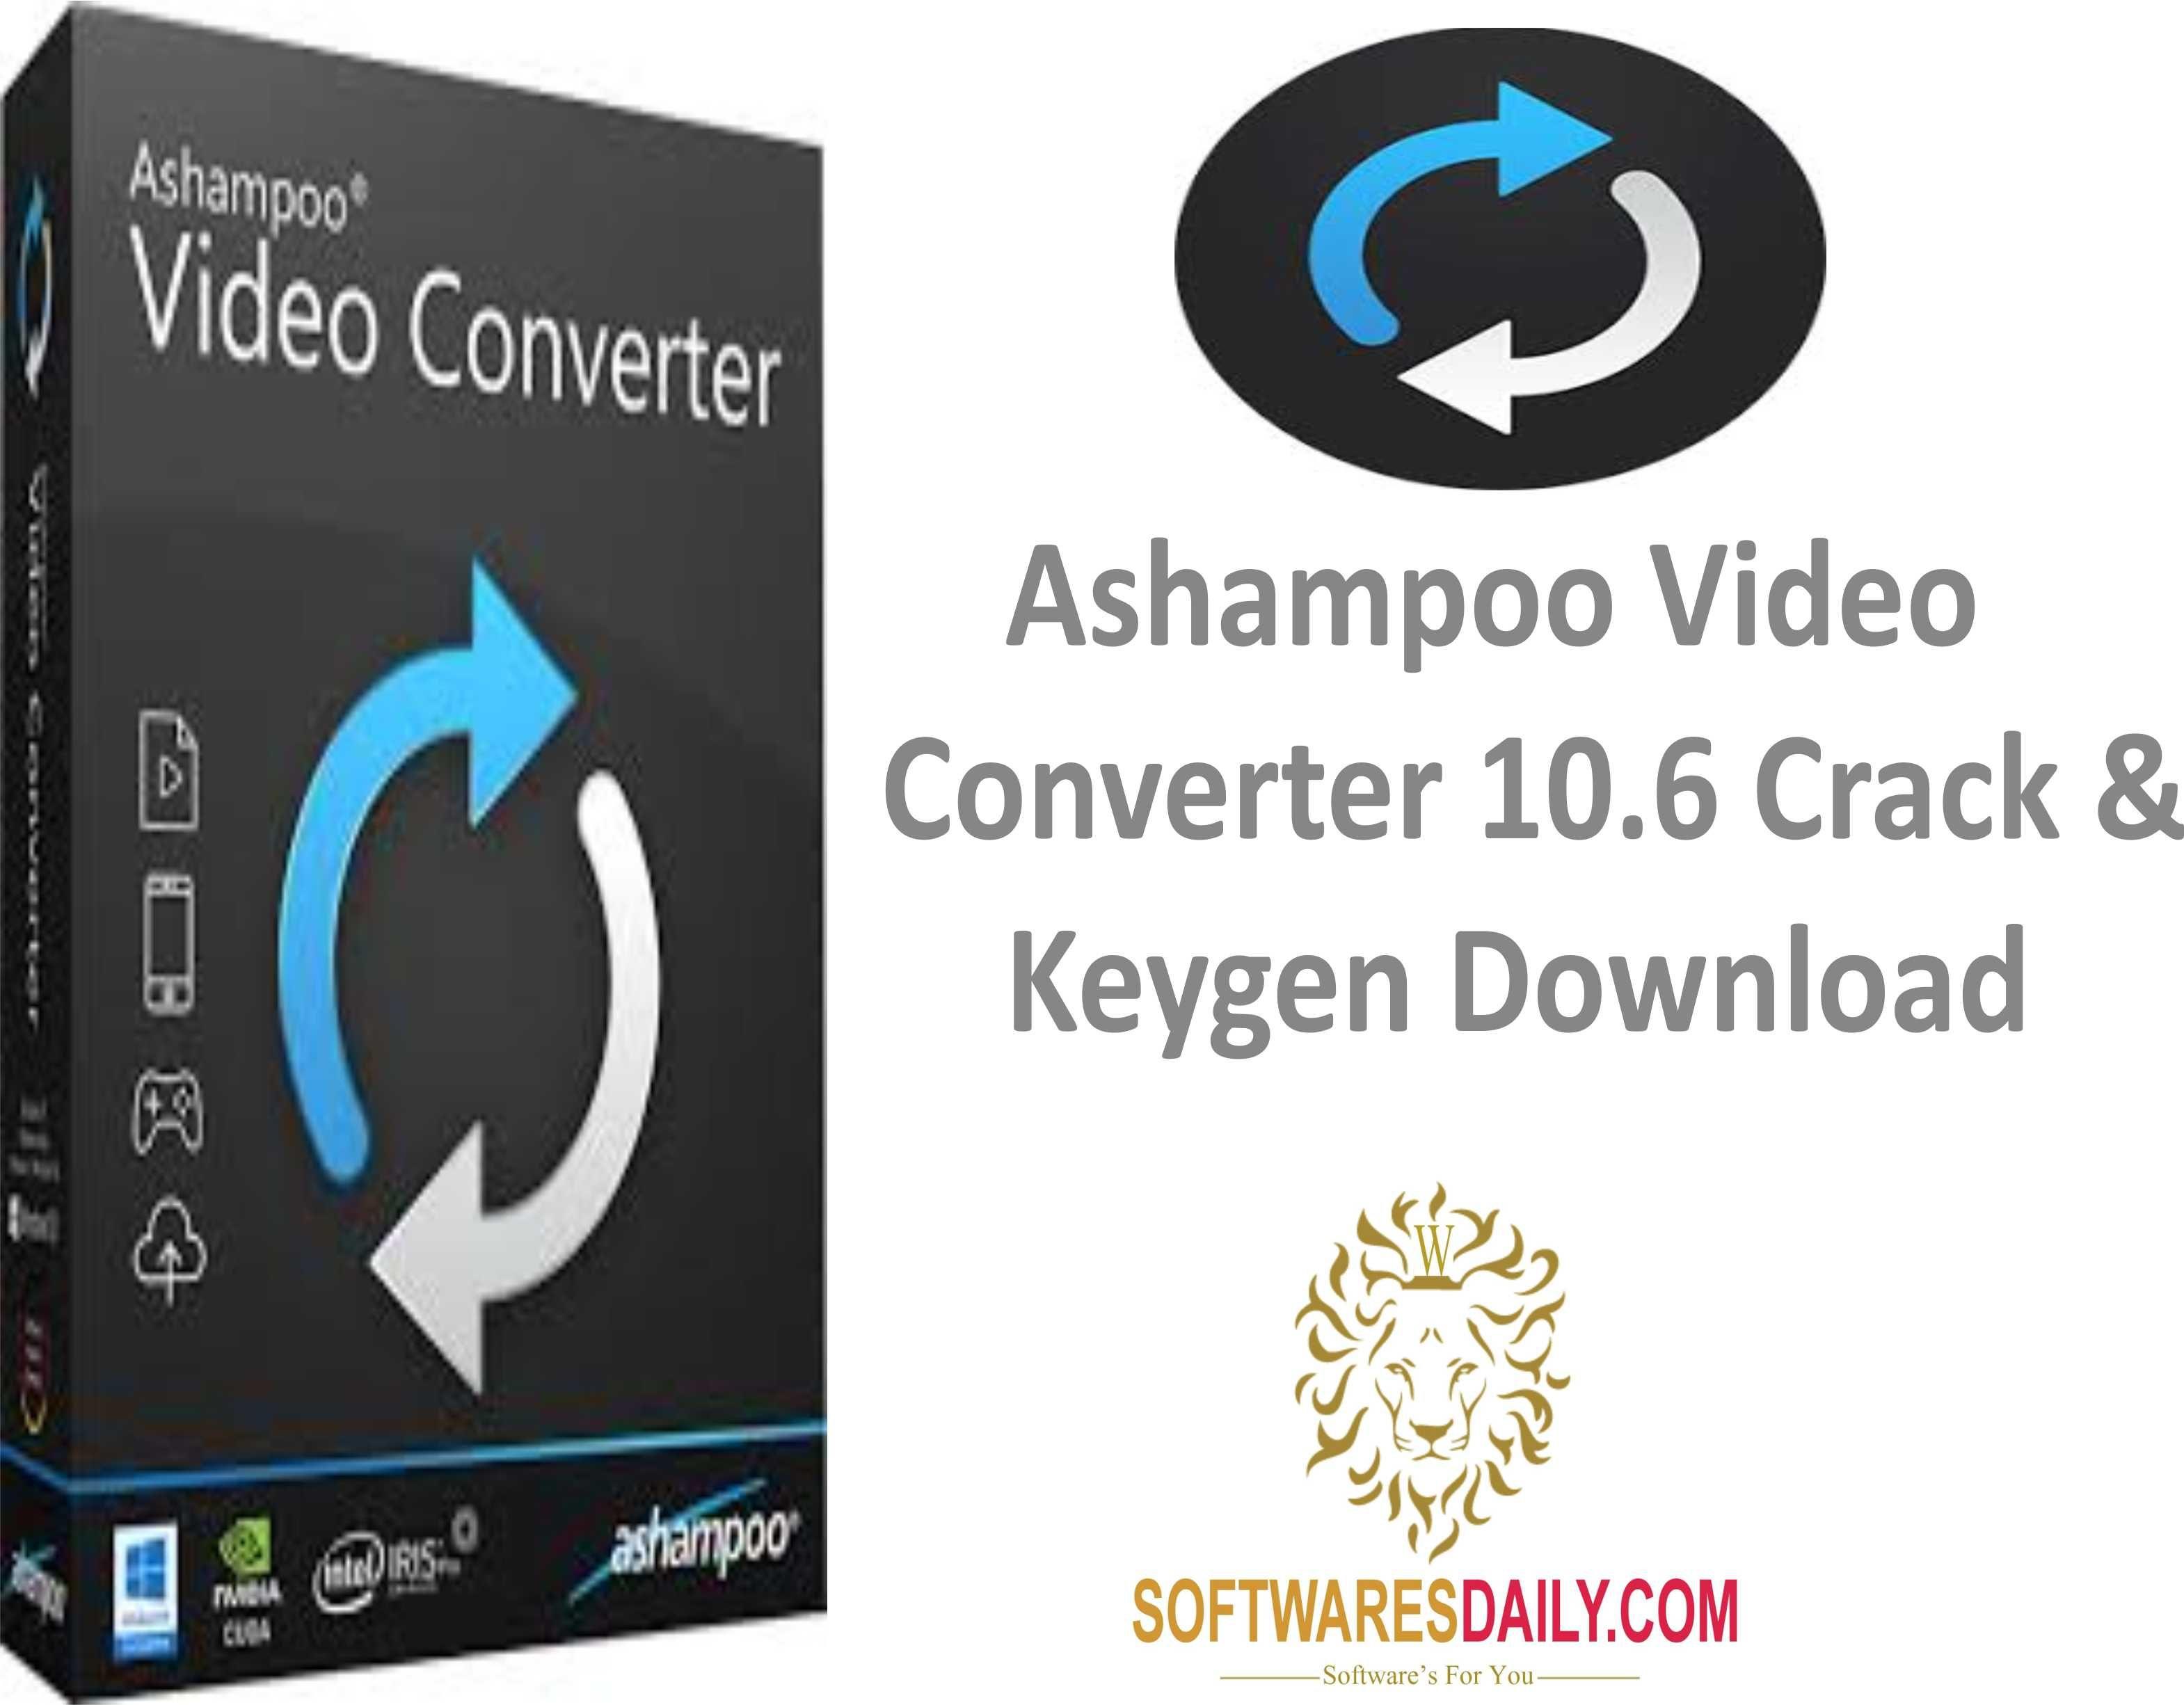 Ashampoo Video Converter 10.6 Crack & Keygen Download,Ashampoo Video Converter 10.6 Crack,Ashampoo Video Converter Keygen Download..........................